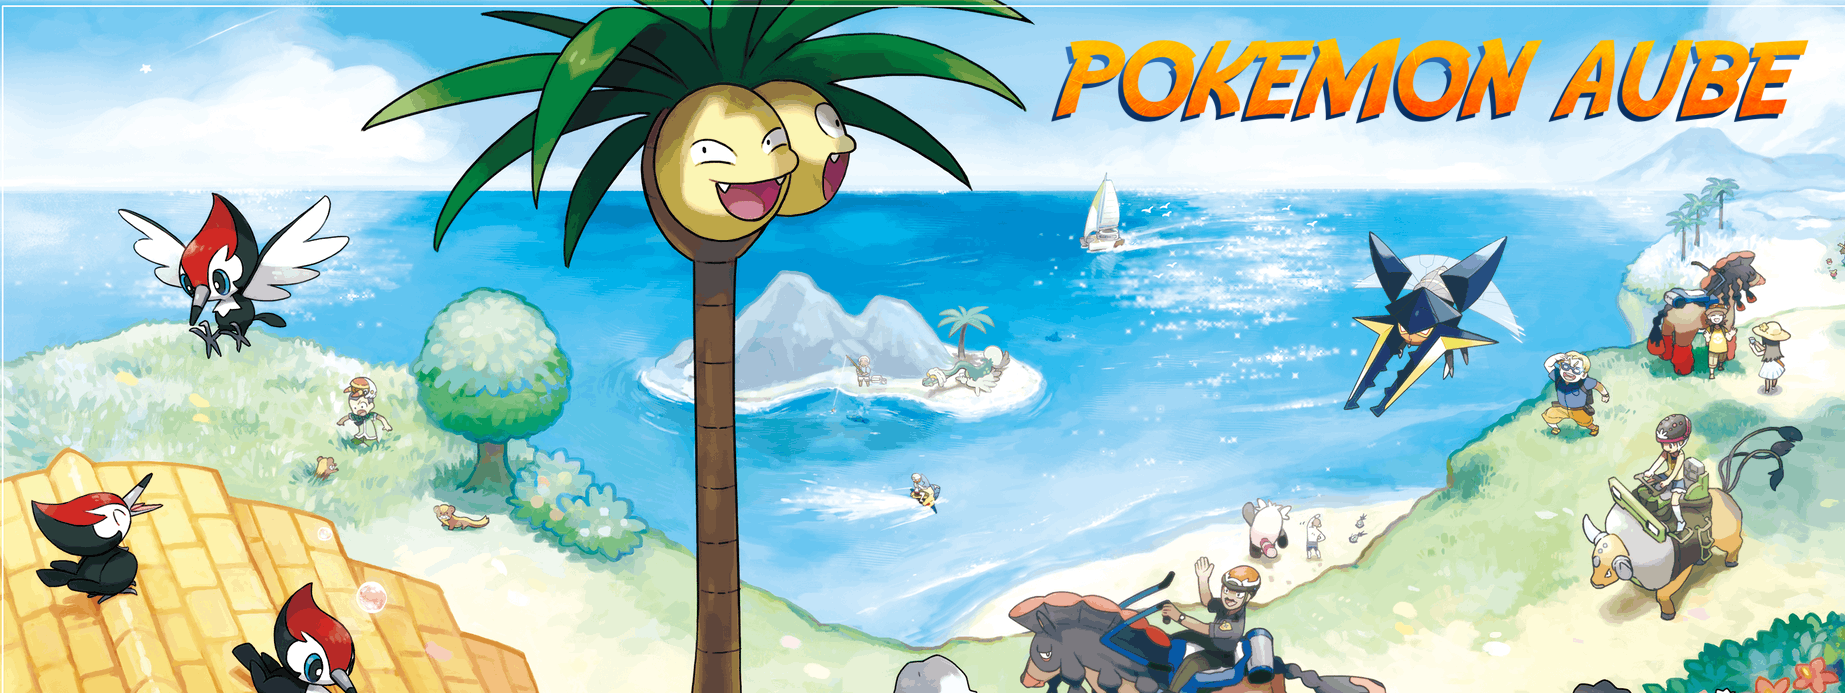 Pokémon Aube Saison 3,5